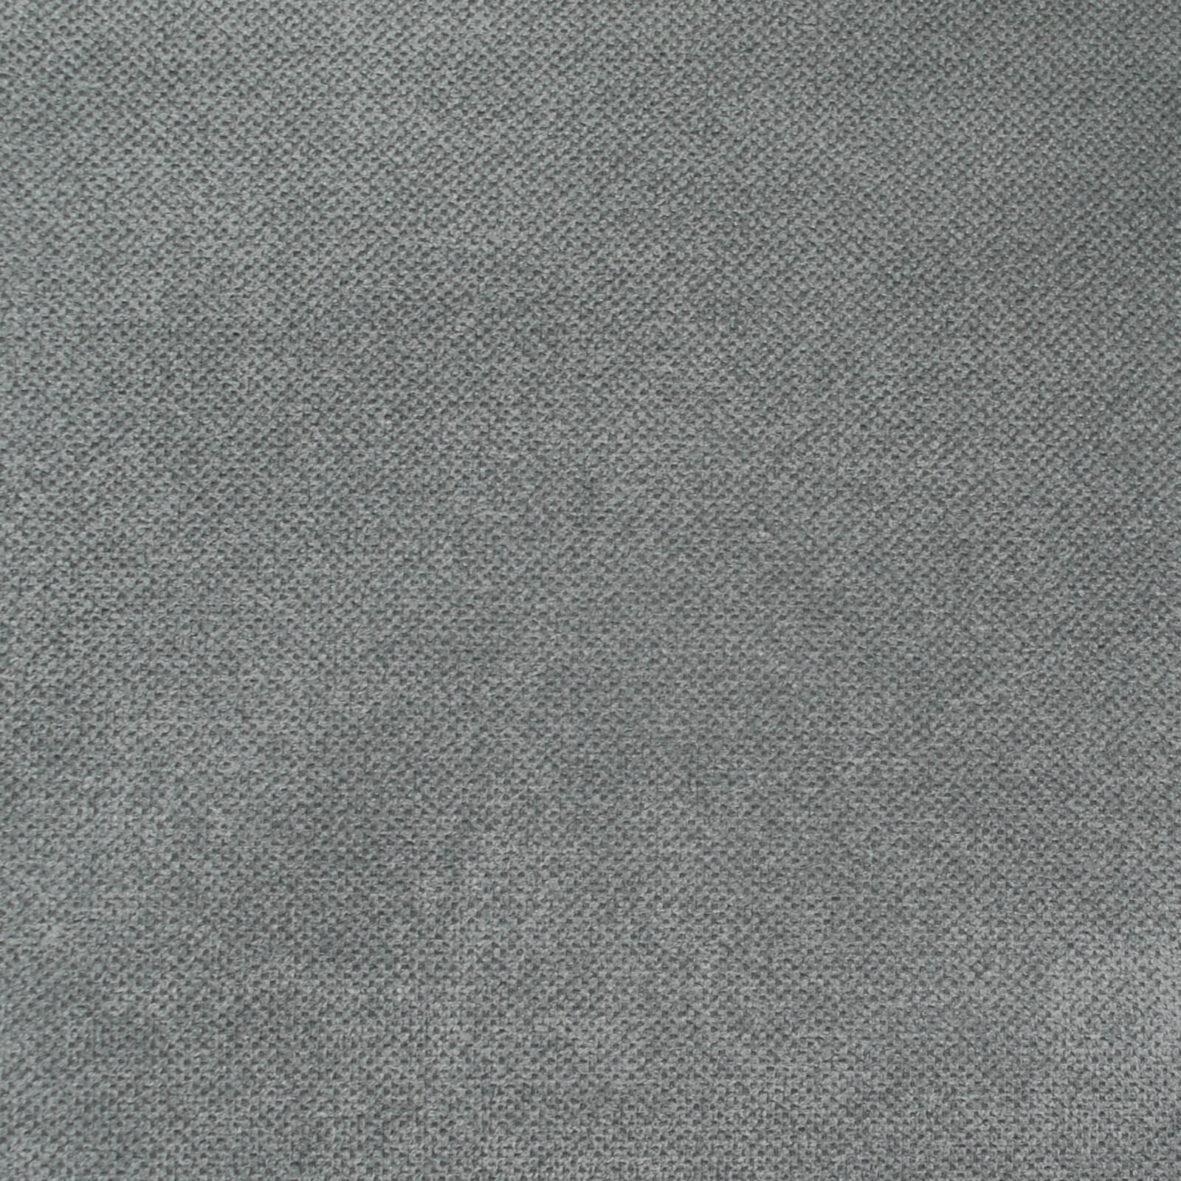 4913-1181x1181